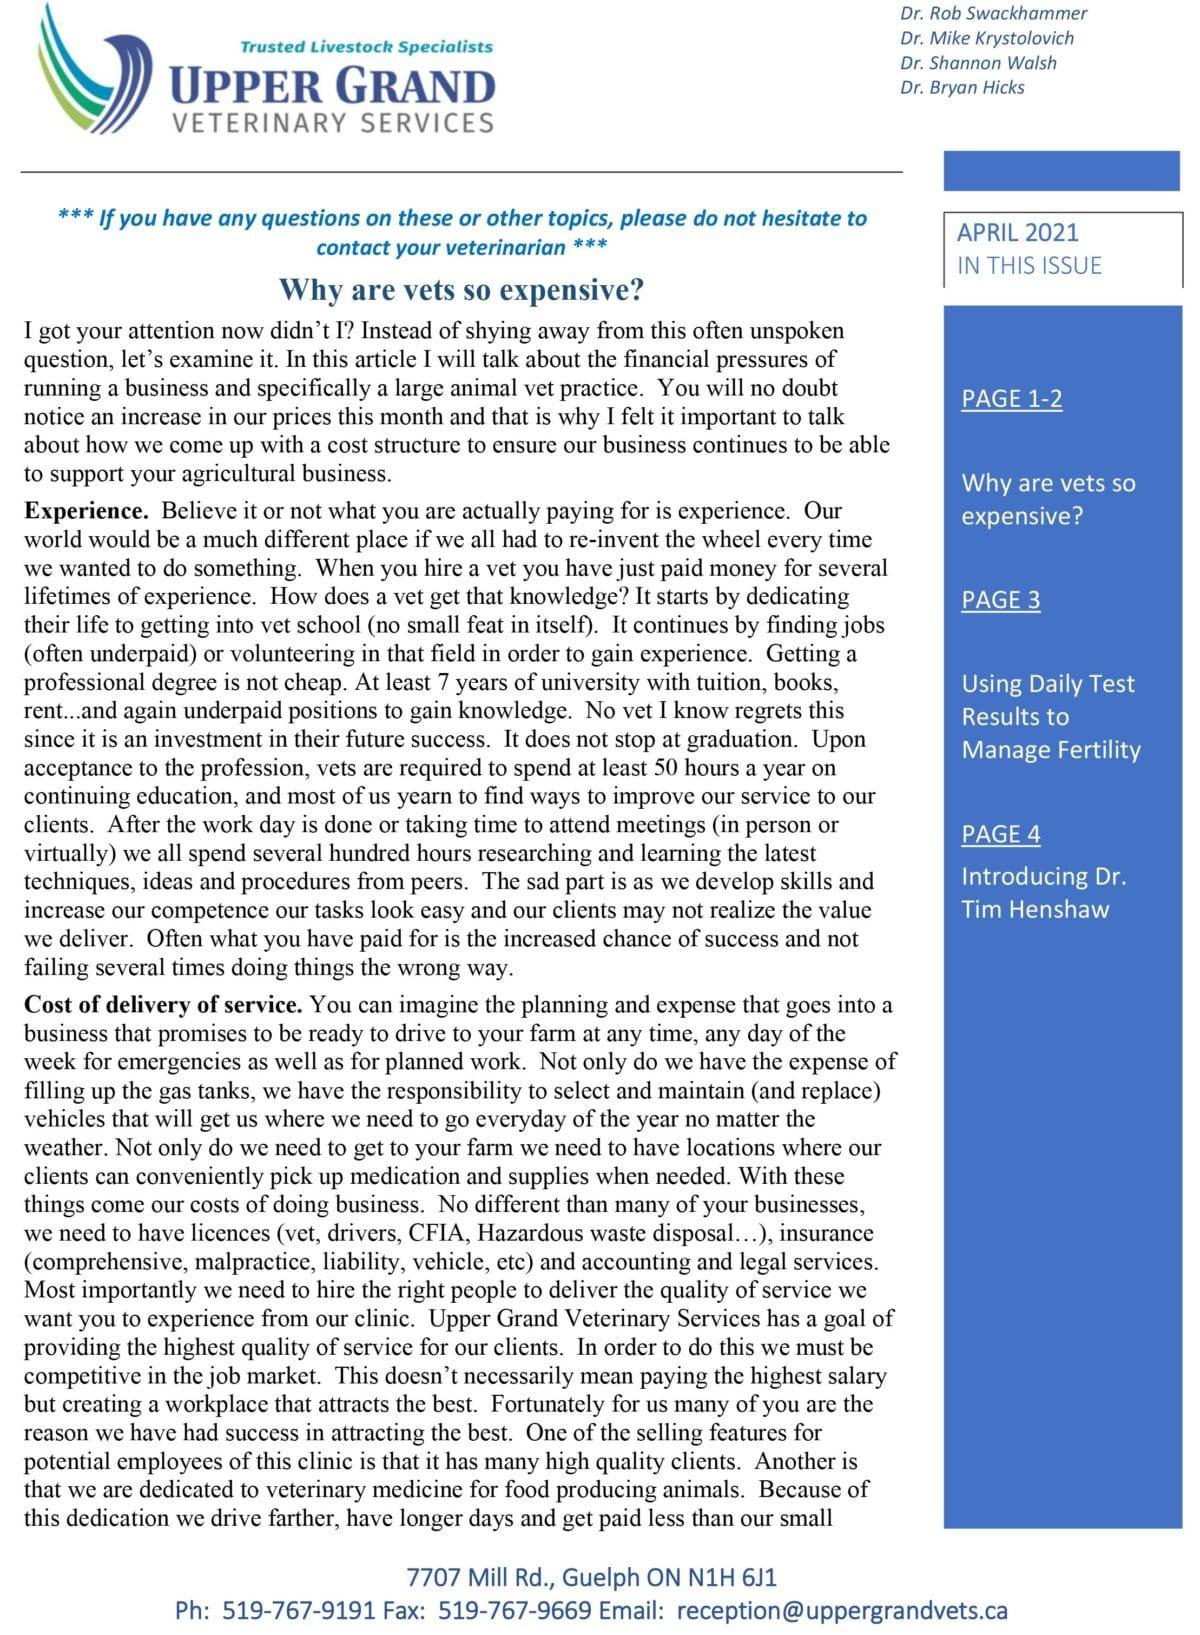 UGVS_04-2021_Newsletter_-1-copy-1200x1635.jpg